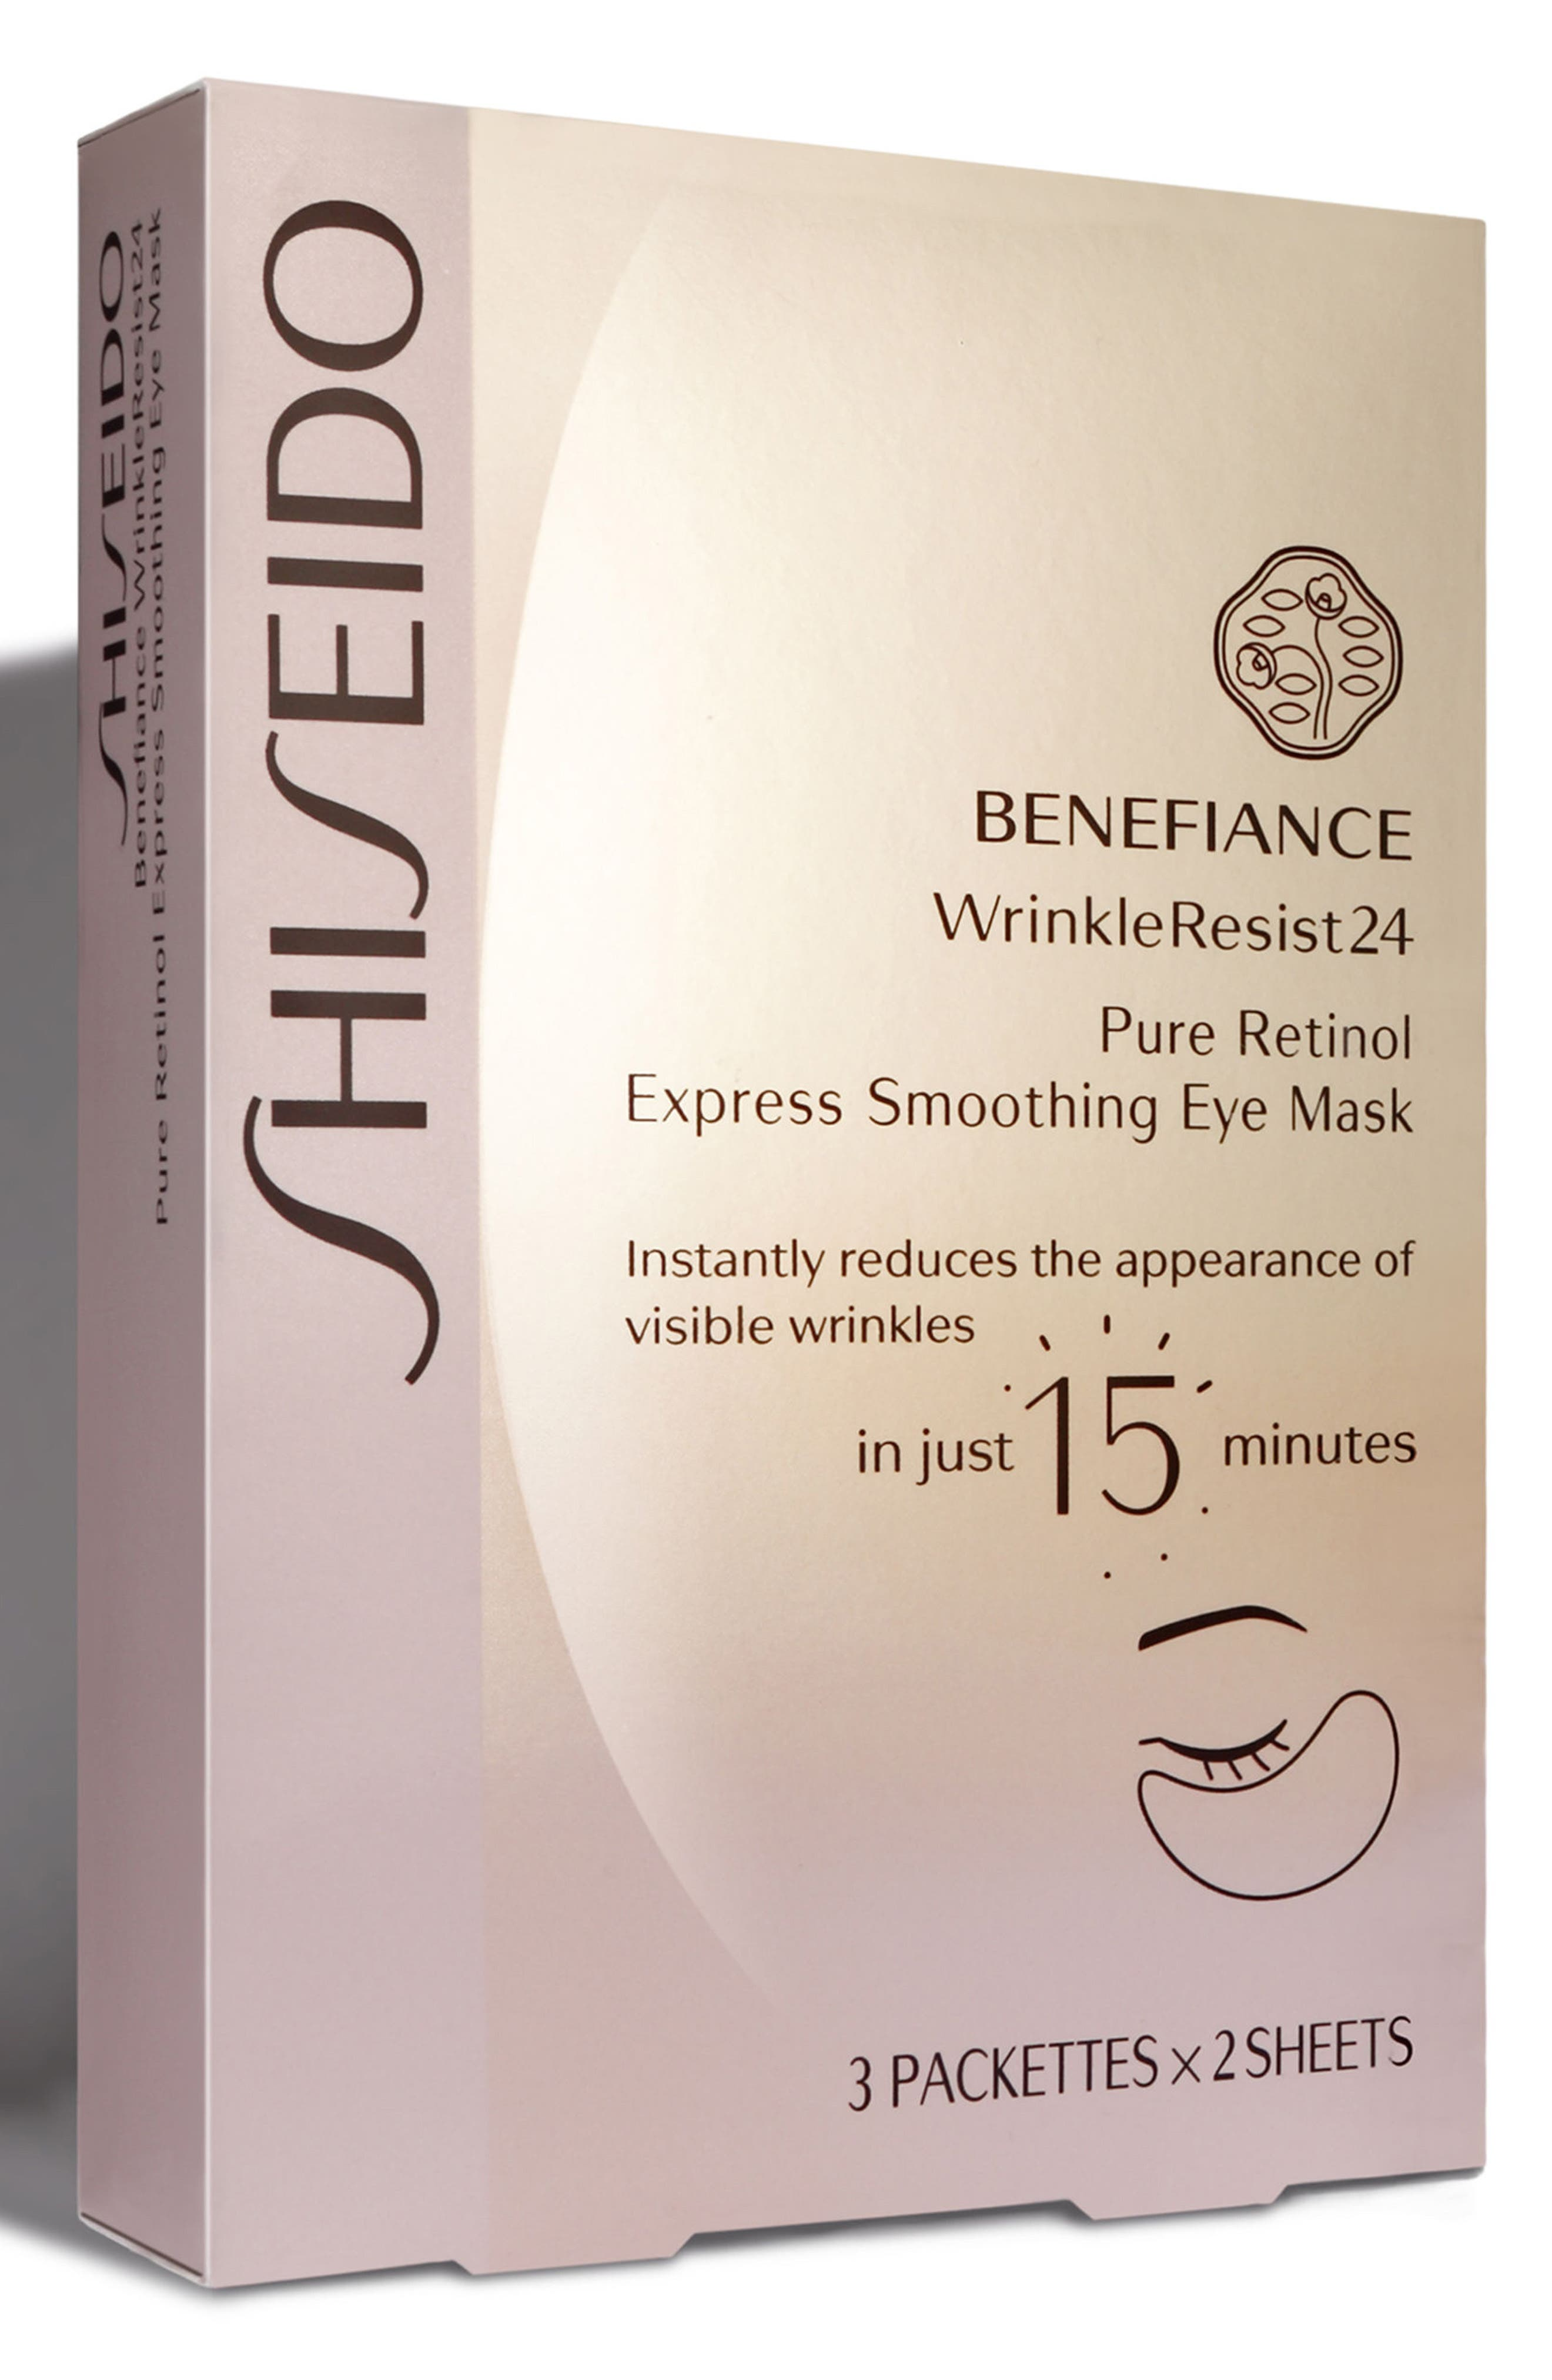 Benefiance WrinkleResist24 Pure Retinol Express Smoothing Eye Mask,                         Main,                         color, No Color